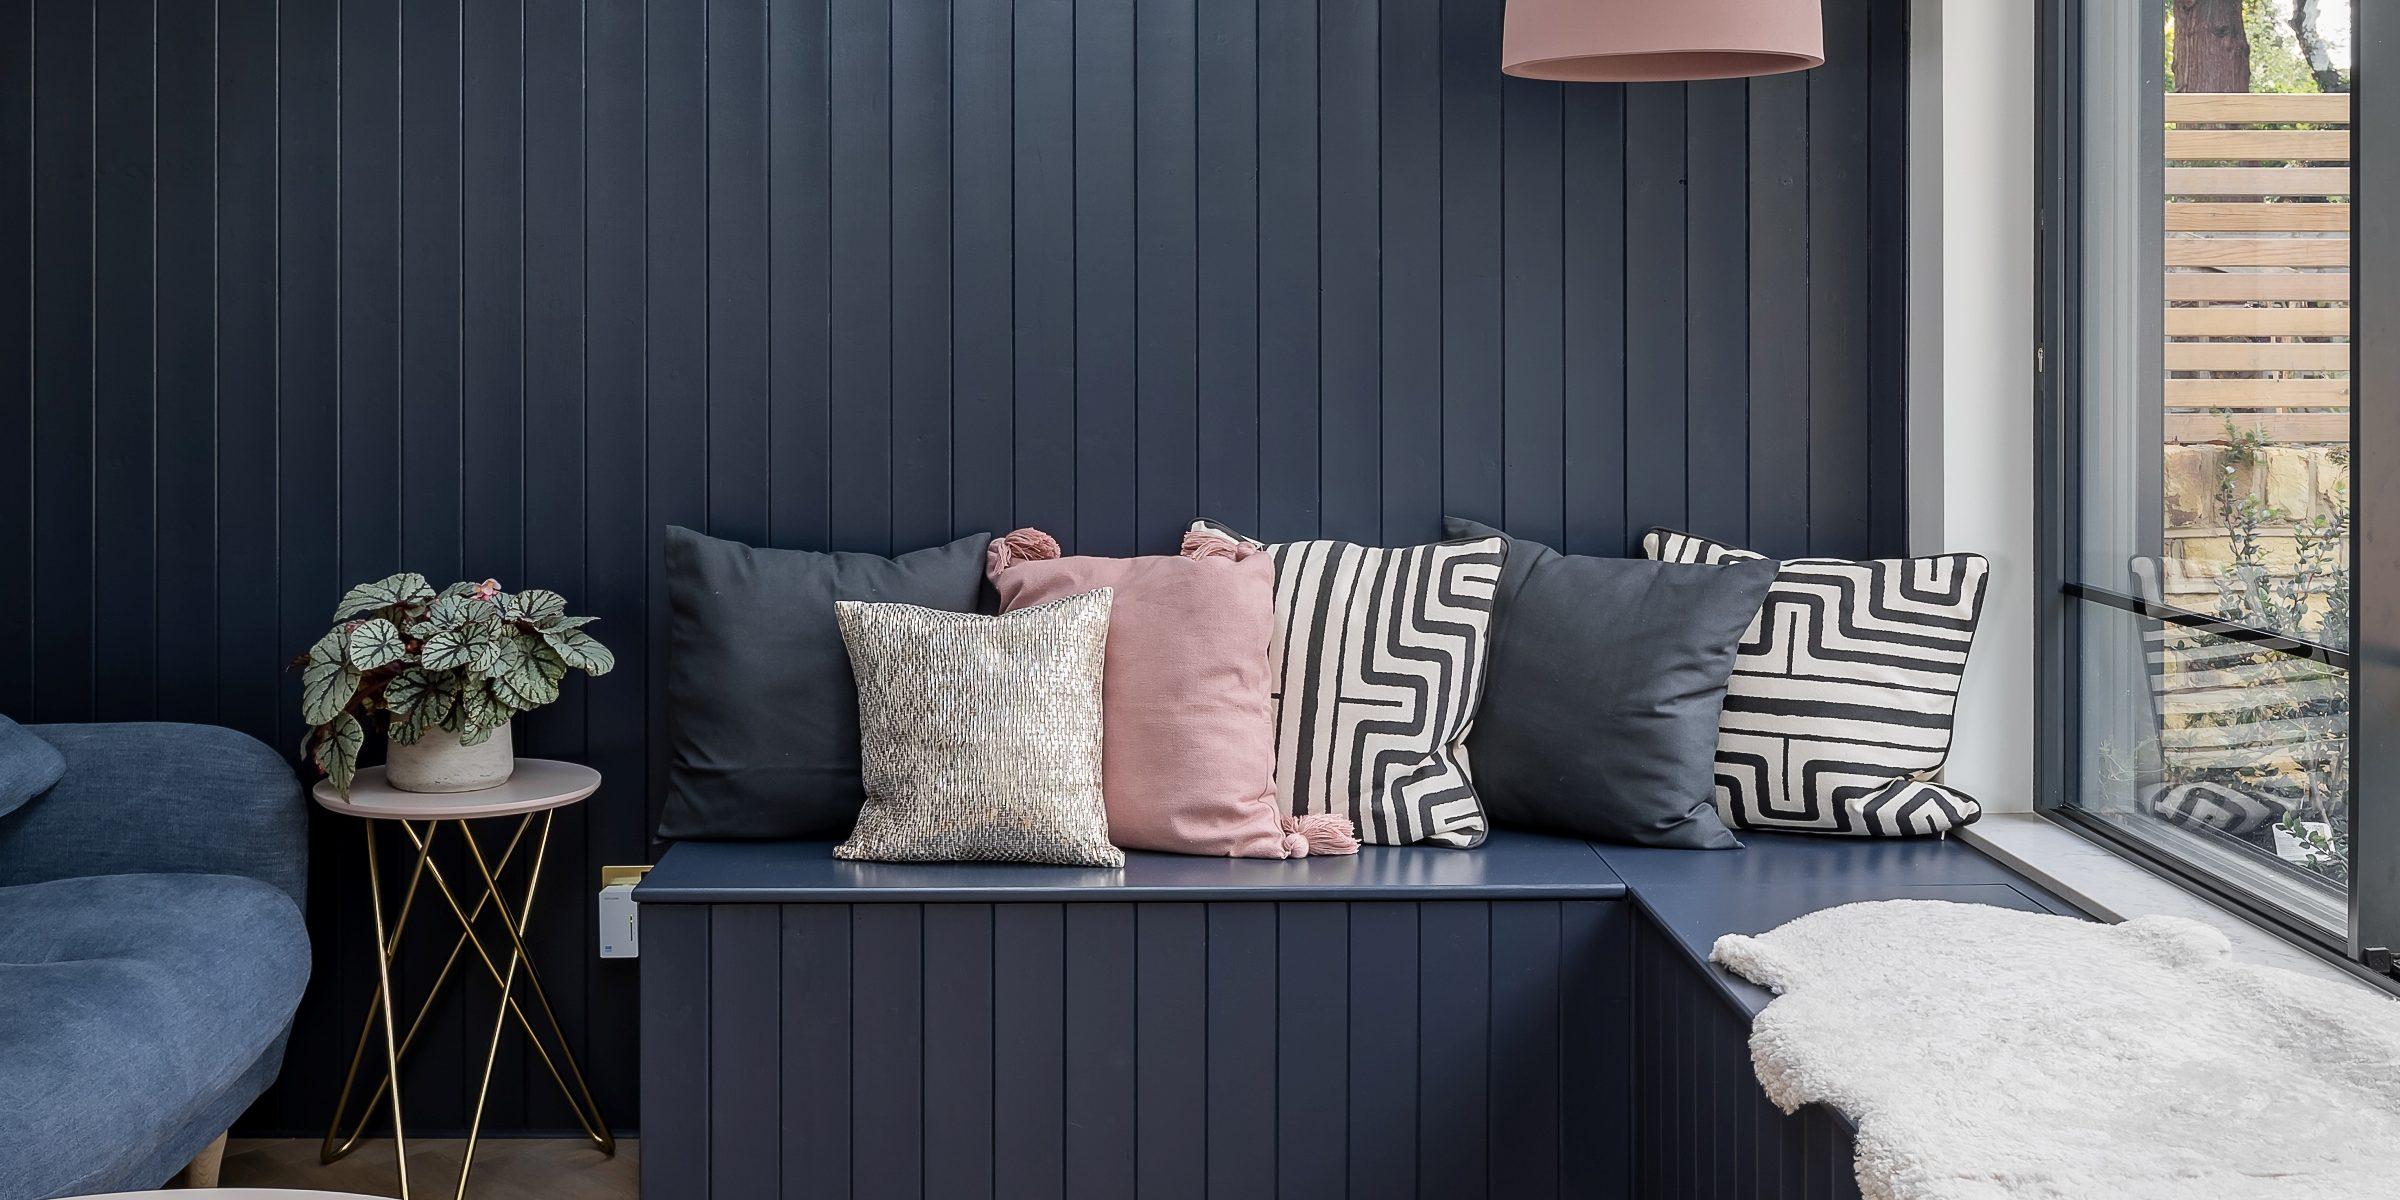 bespoke wood bench with zigzag wood floors